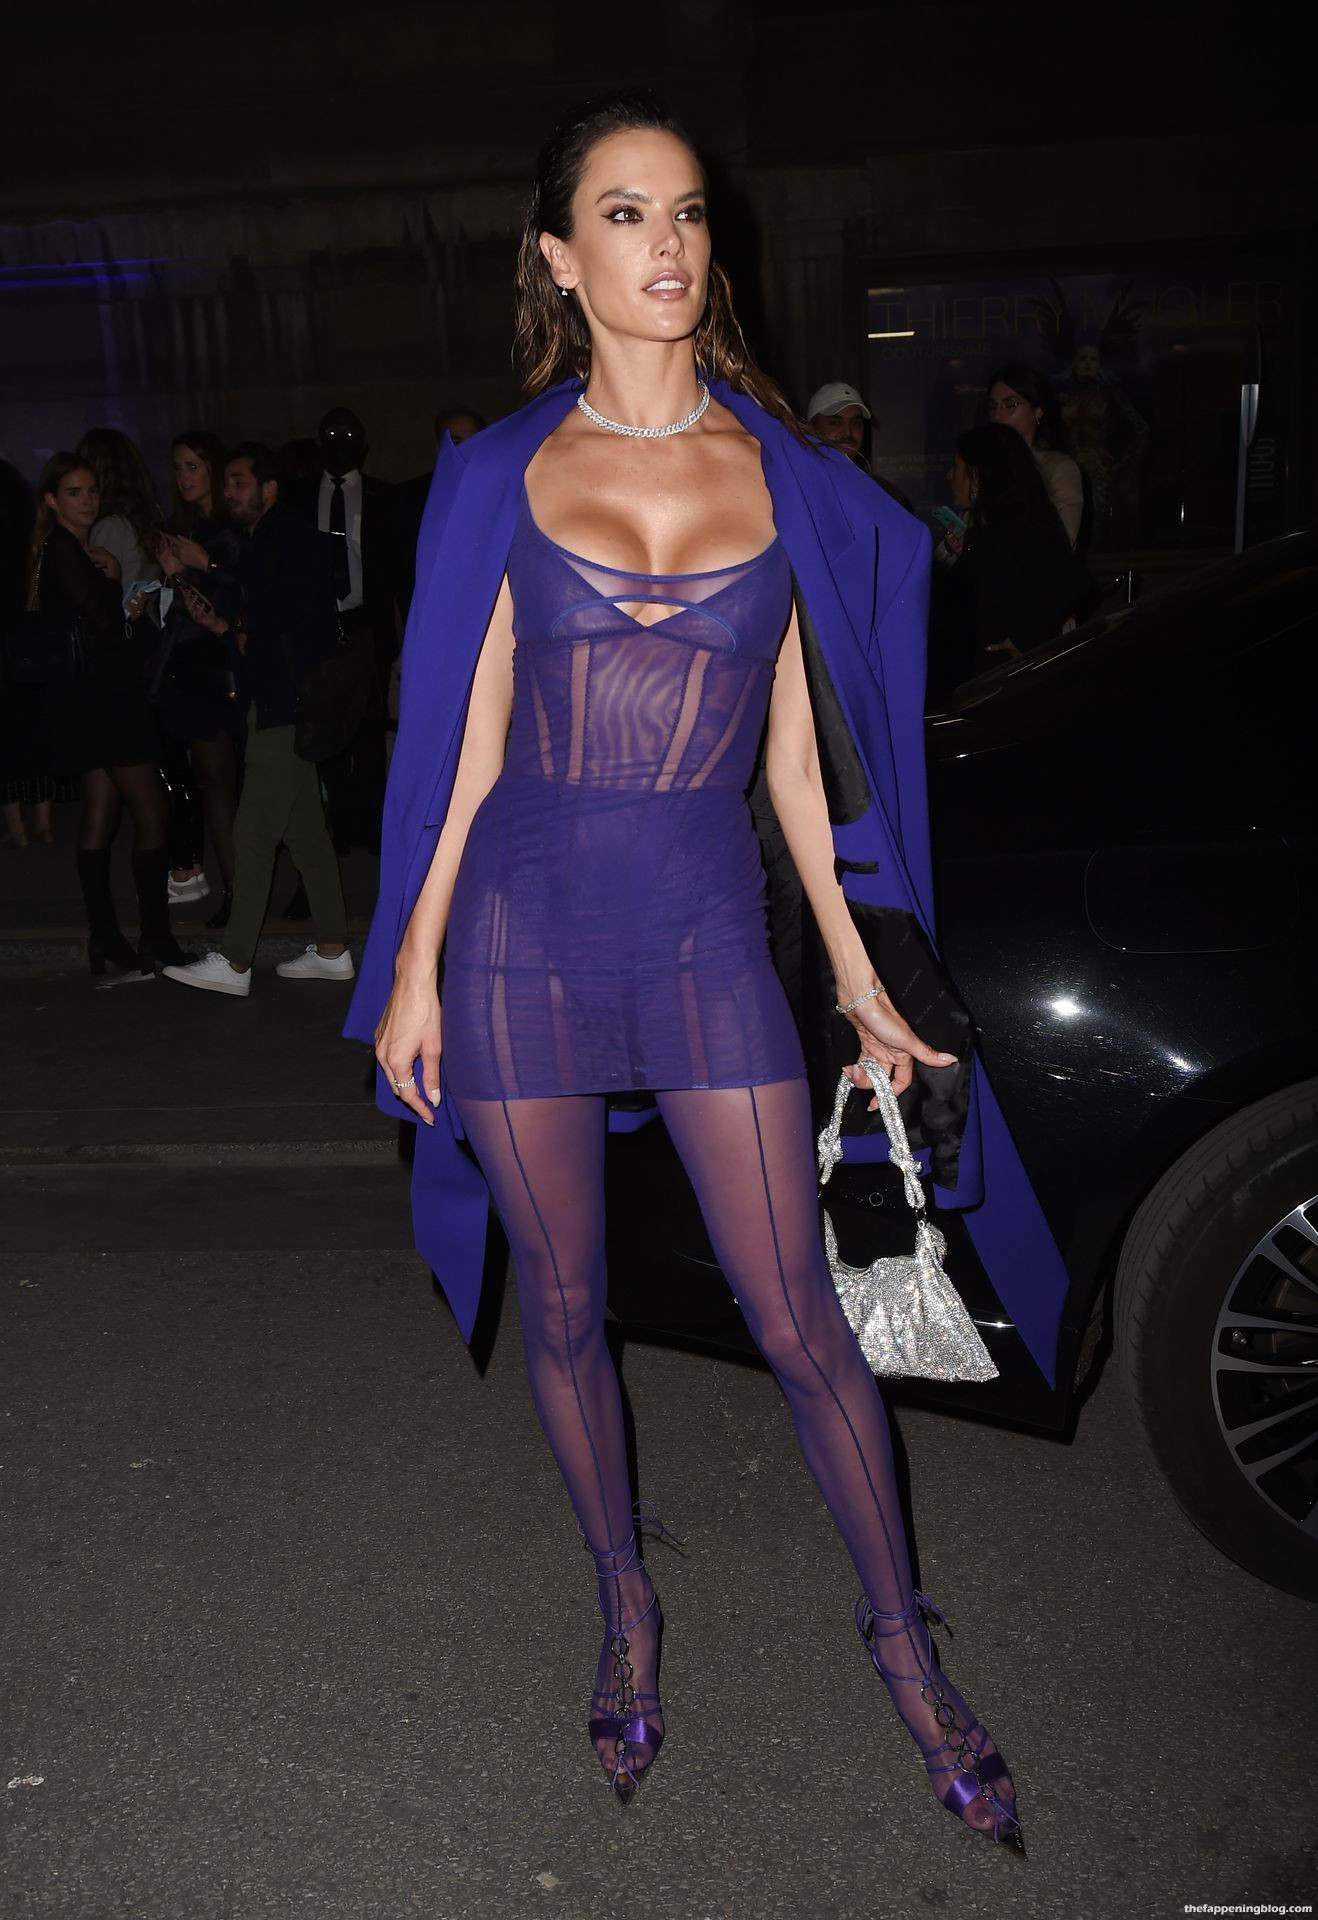 Alessandra-Ambrosio-Sexy-The-Fappening-Blog-25-3.jpg